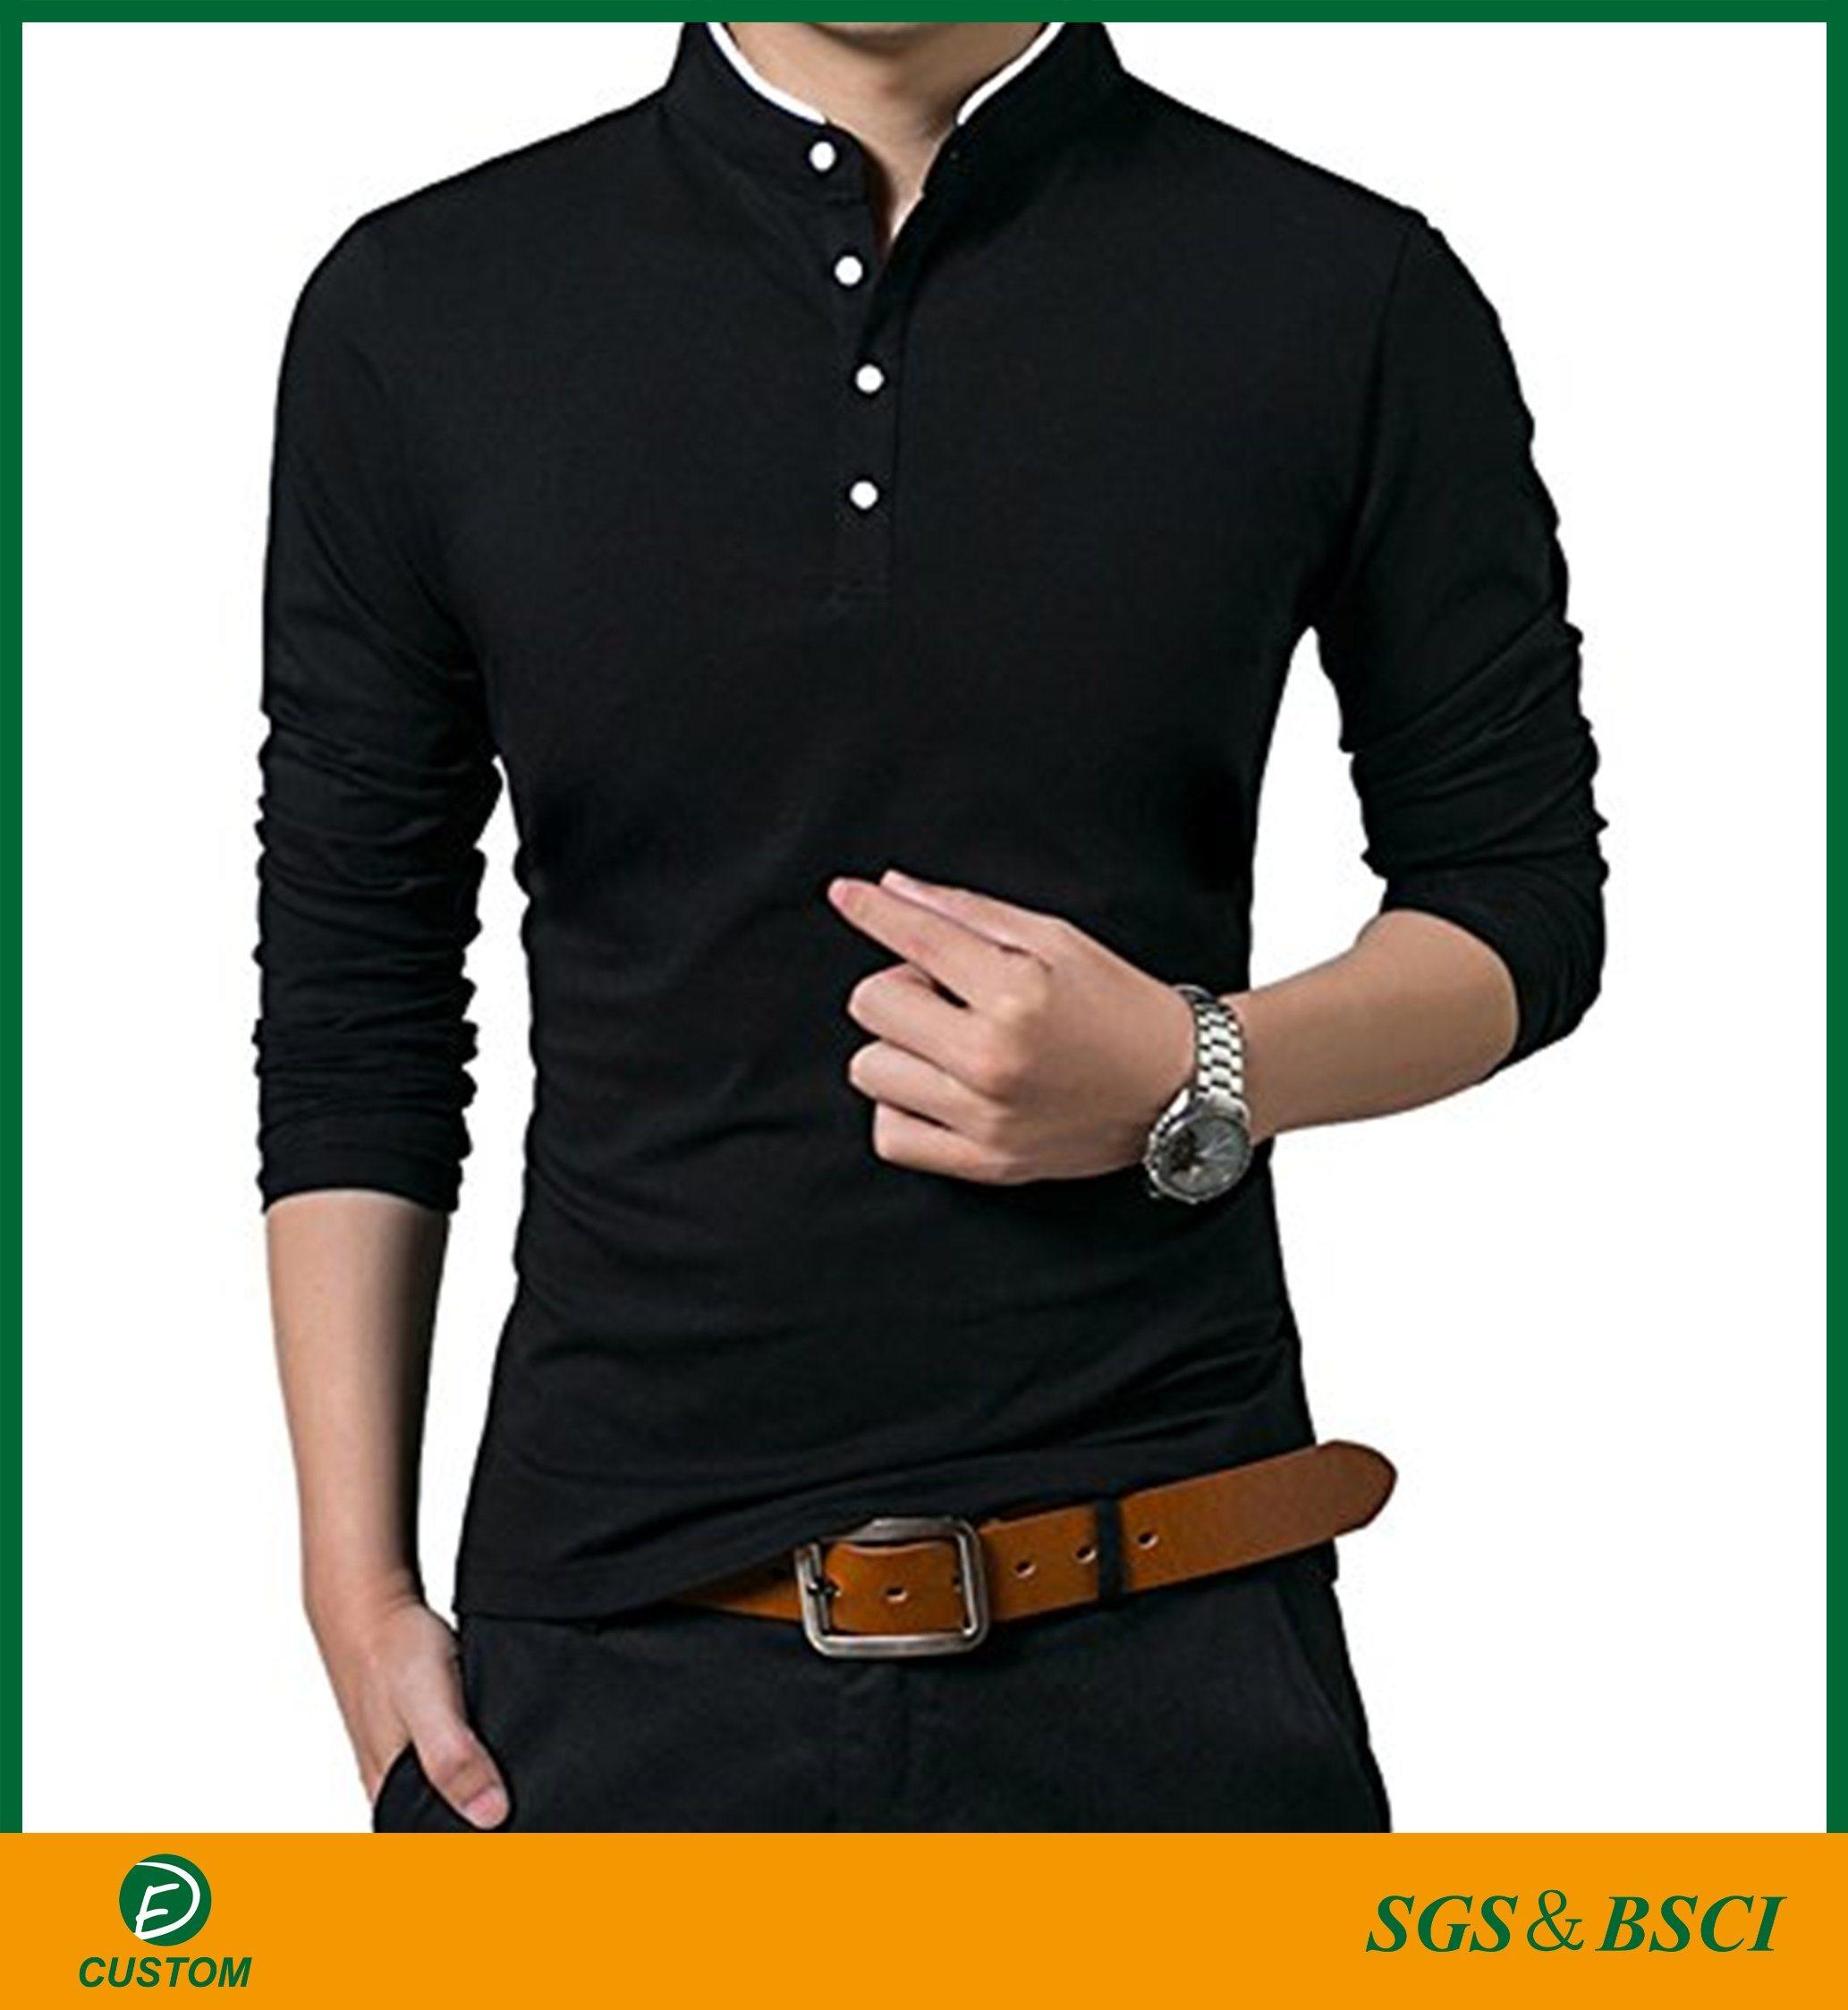 099ecdc69466 China Guangzhou Factory Best Quality Men′s Polo Shirts with Cheap ...